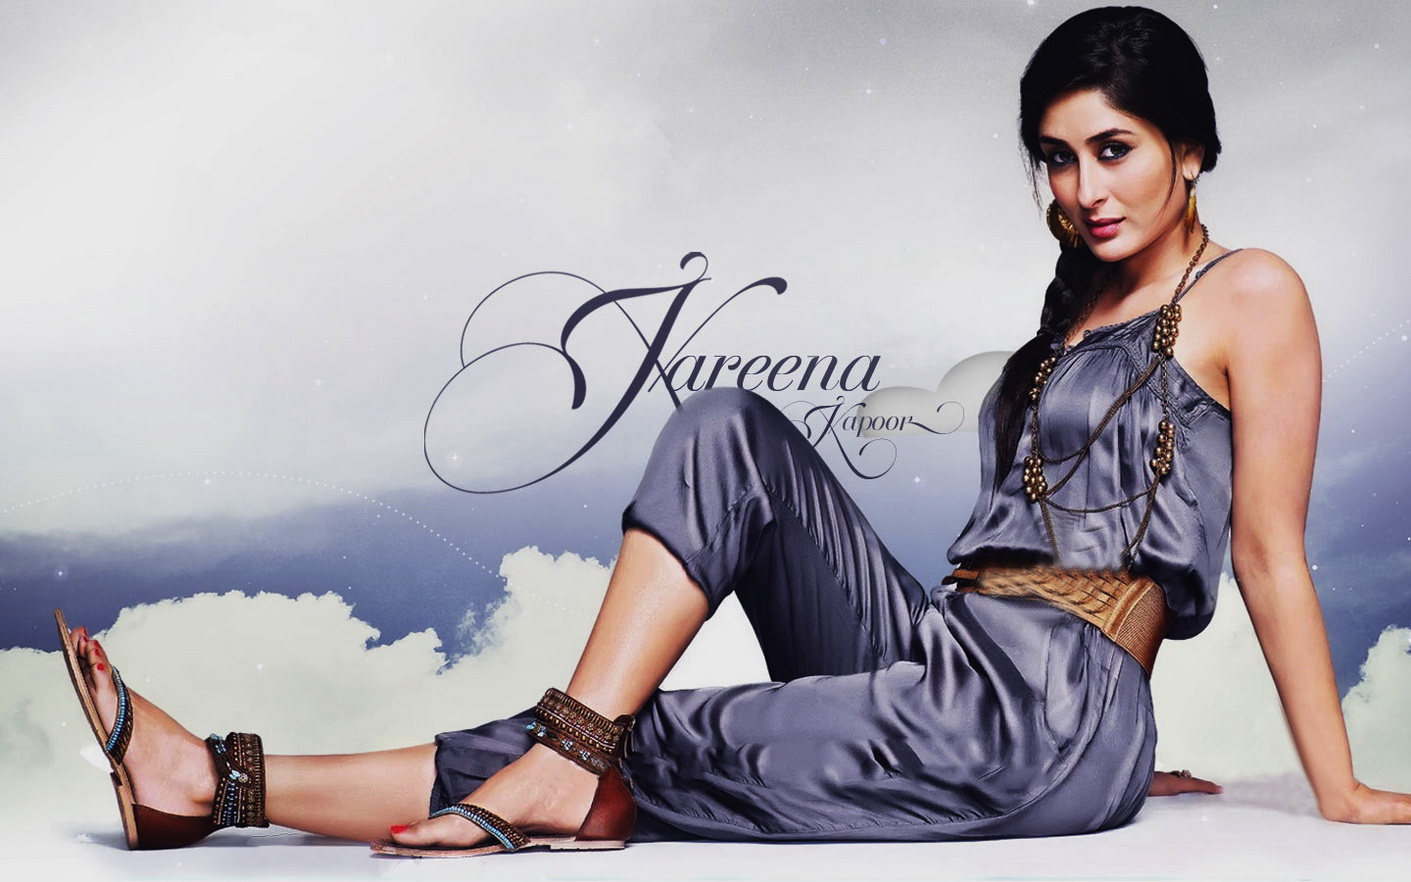 Kareena Kapoor Hot  Sexy Bikini 1080P Hd Wallpaper And -2367